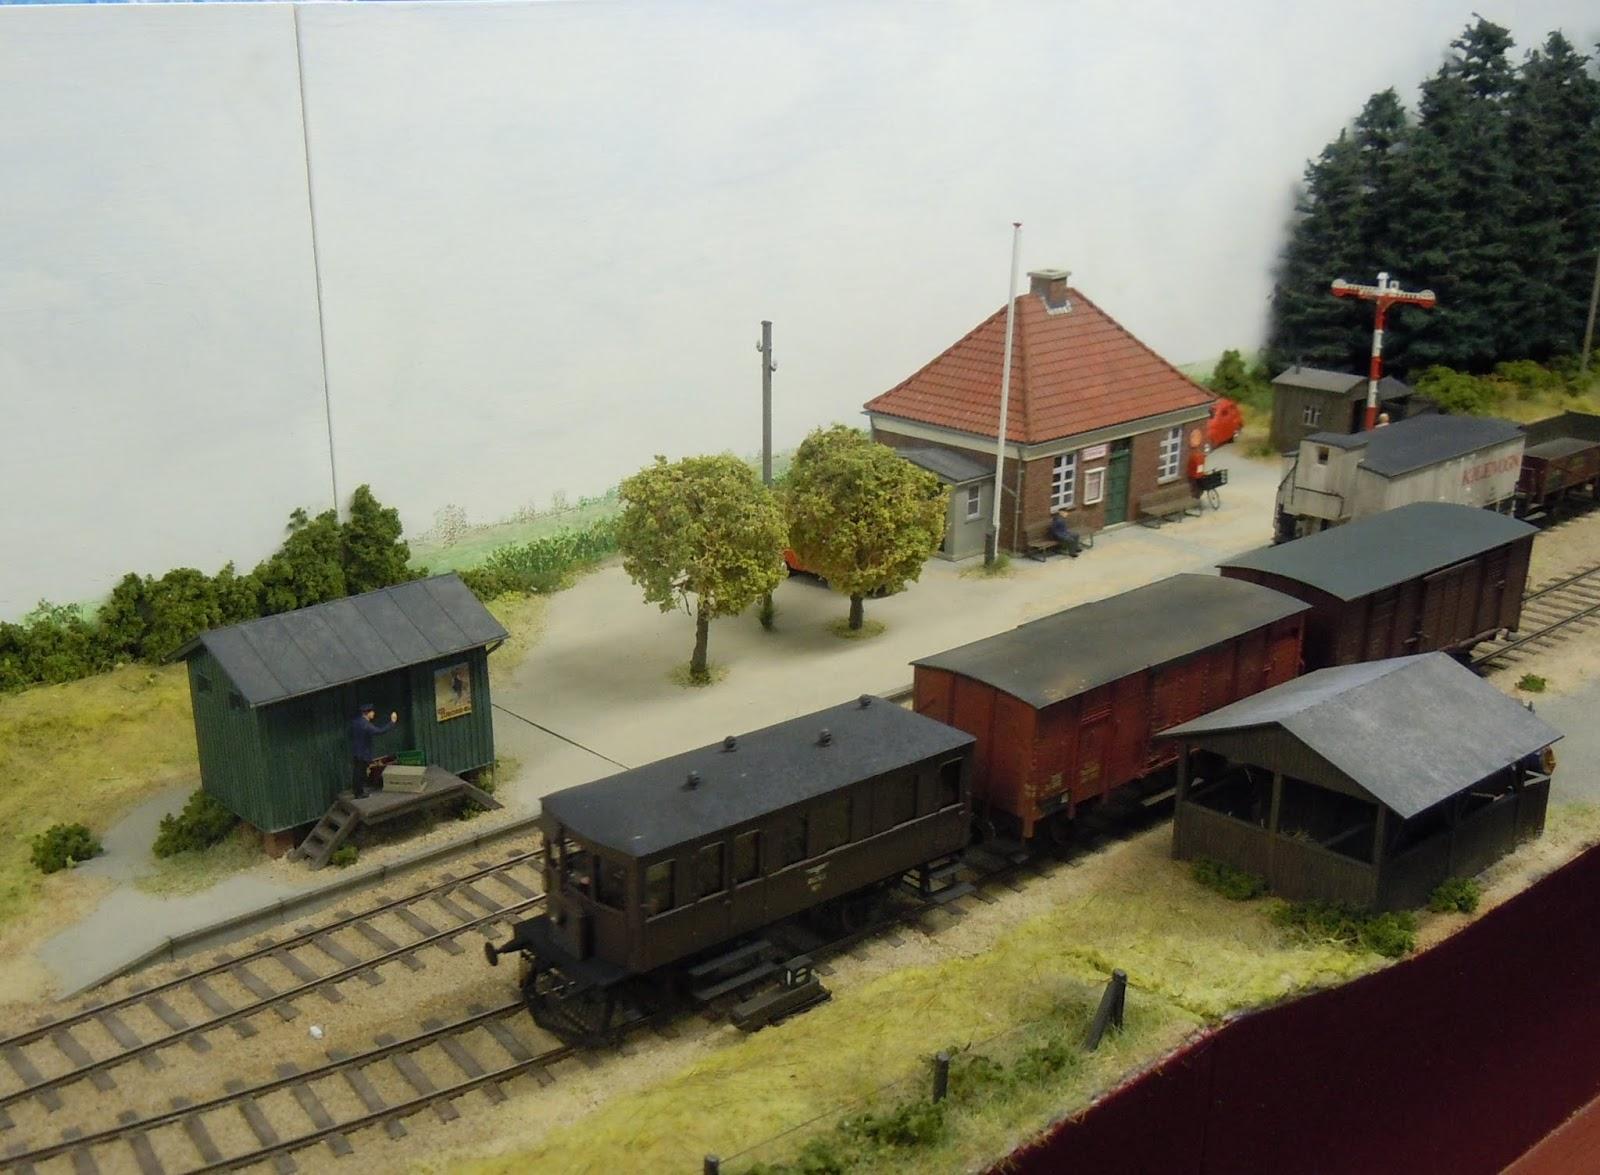 Michael S Model Railways A Trip To Uckfield